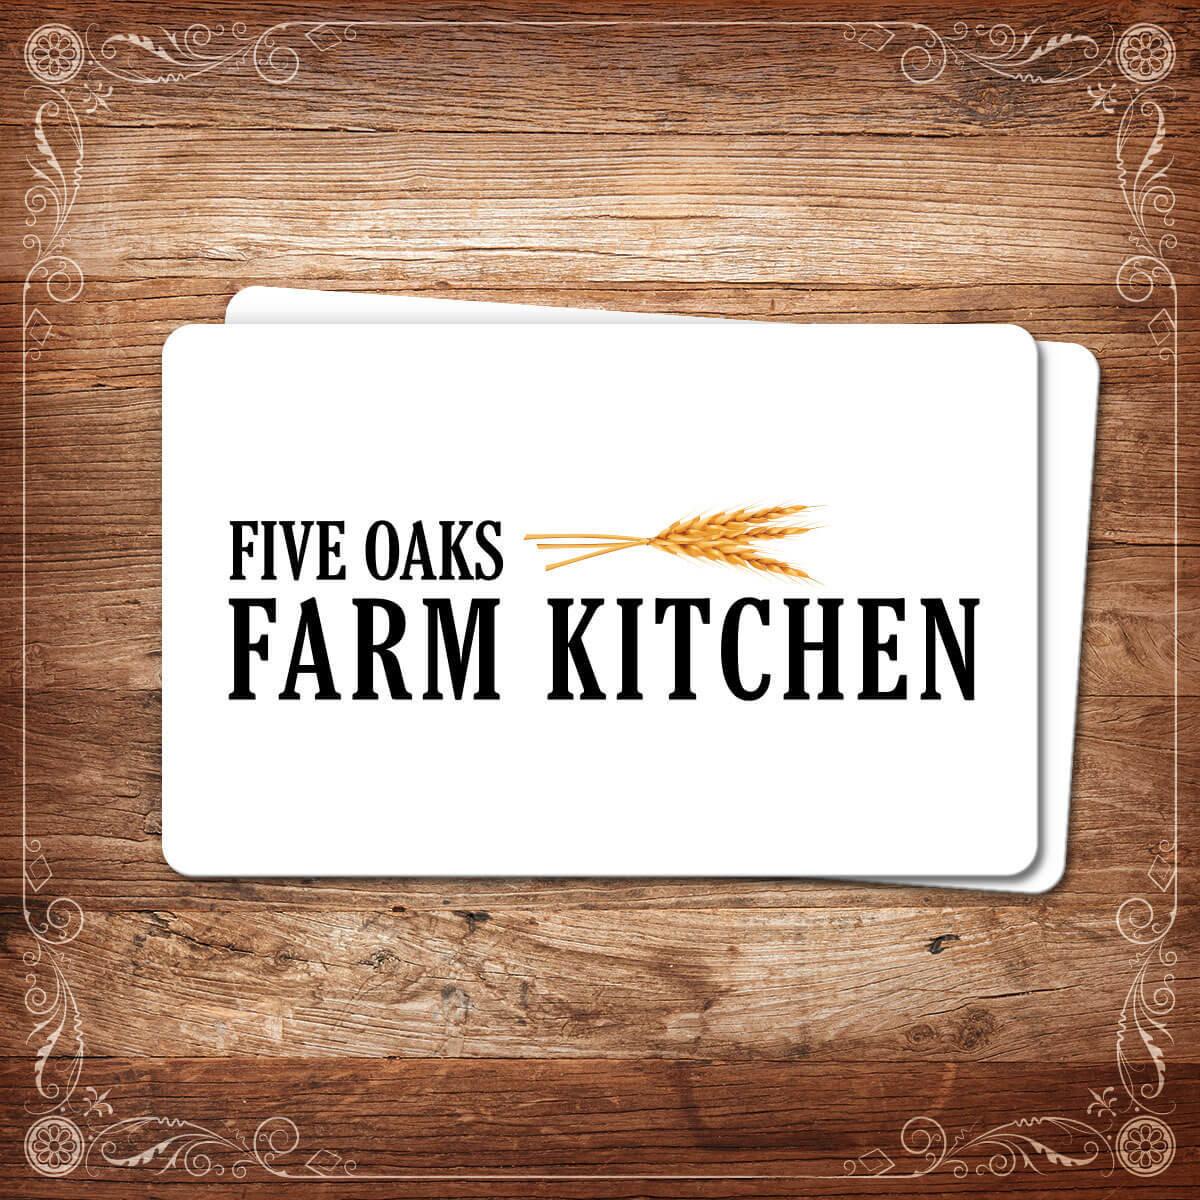 Five Oaks Farm Kitchen Gift Card 00150